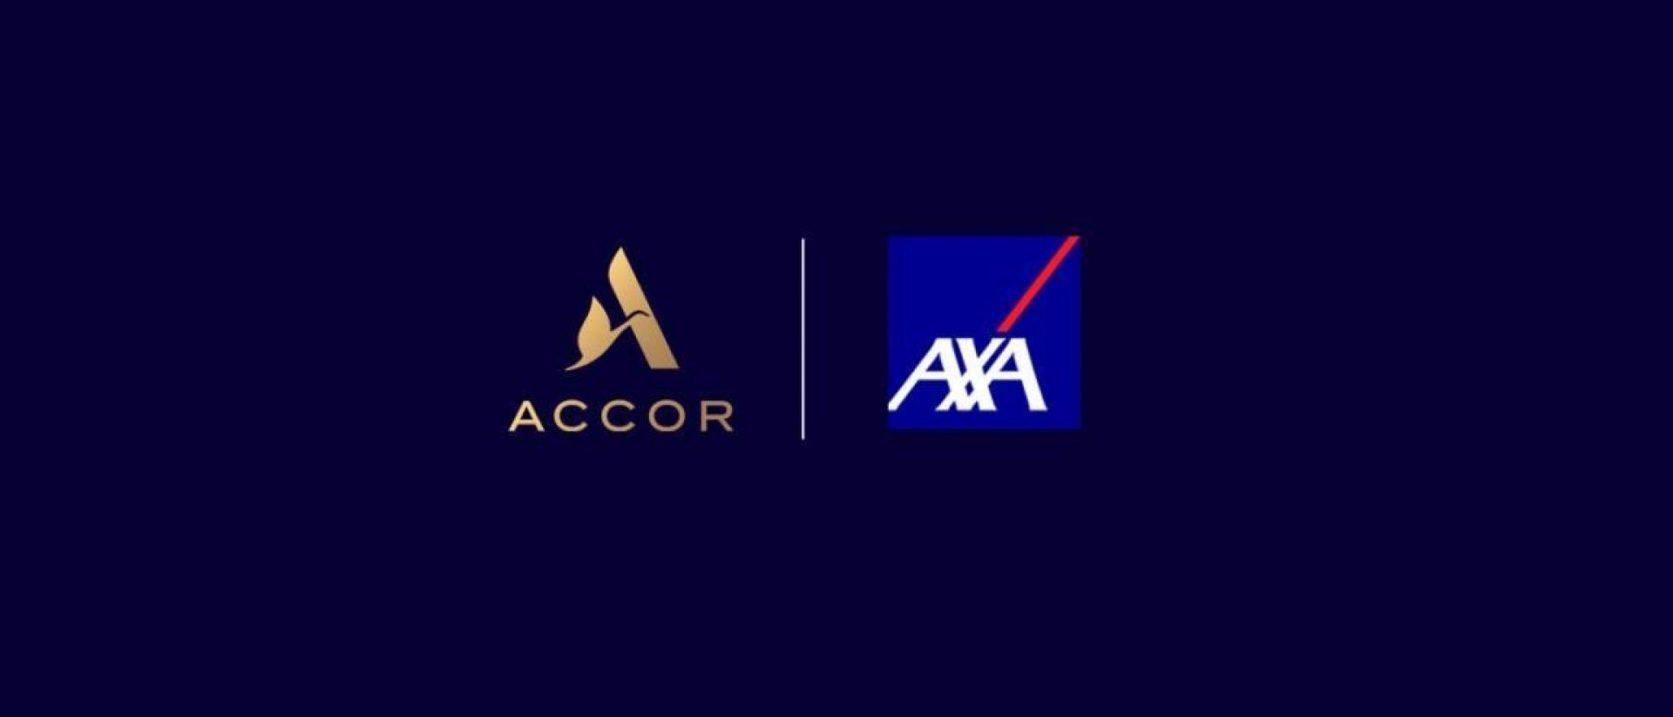 AXA – Global Leader in Insurance & Assistance